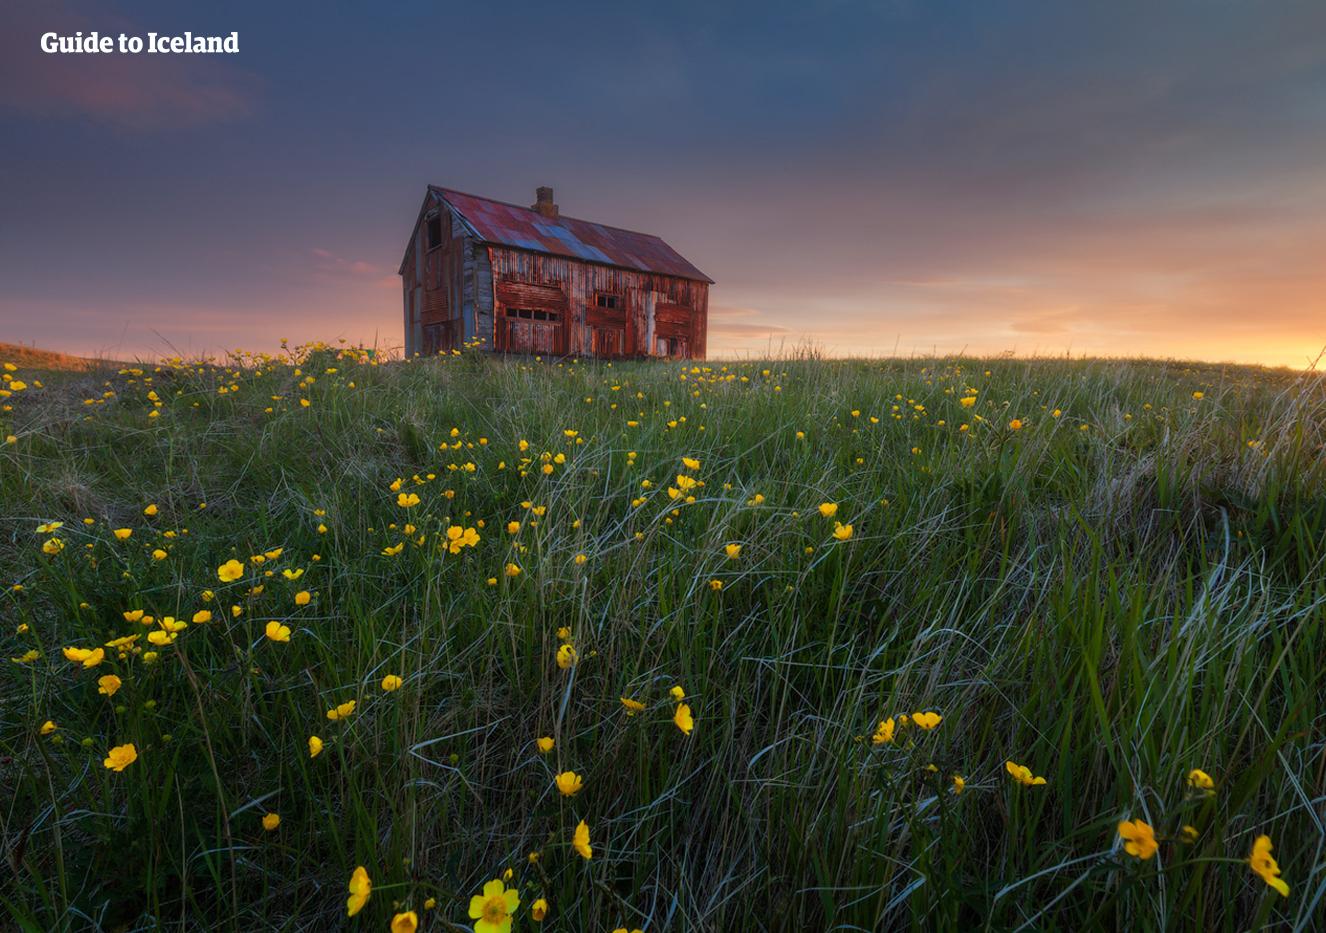 6 Day Midnight Sun Summer Self Drive Tour of Iceland's Hidden Gems & Black Sand Beaches - day 2